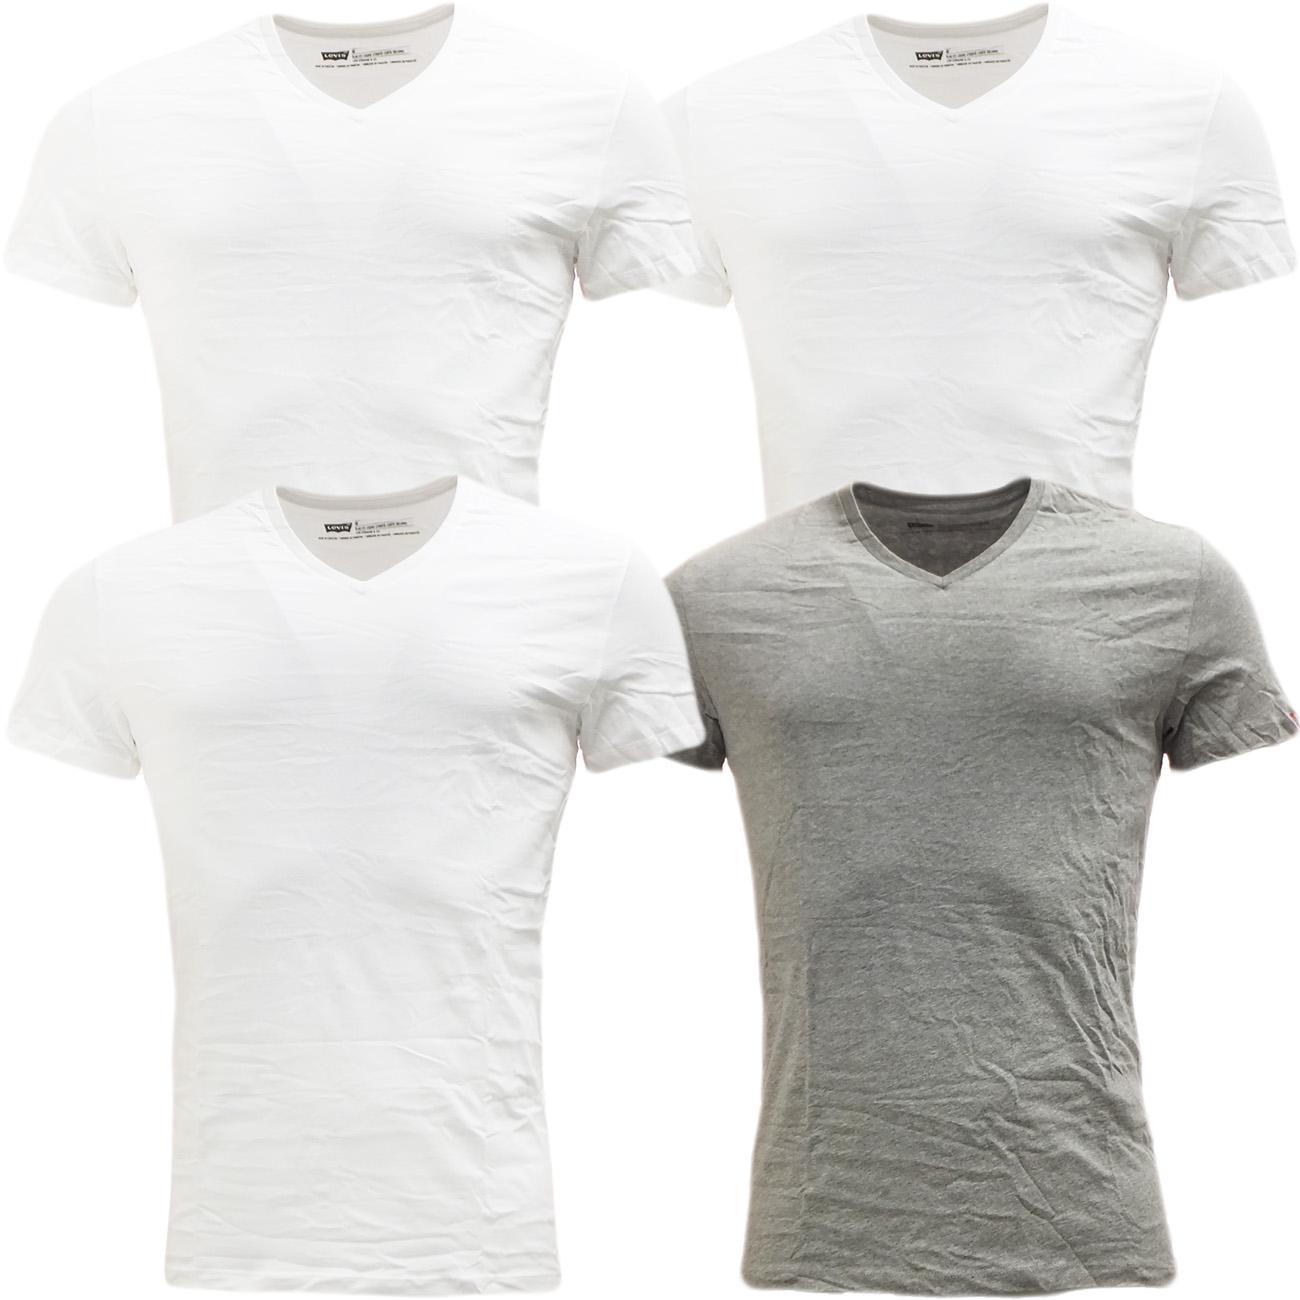 Levi strauss plain v neck t shirt pack of 2 t shirts for Levis plain t shirts